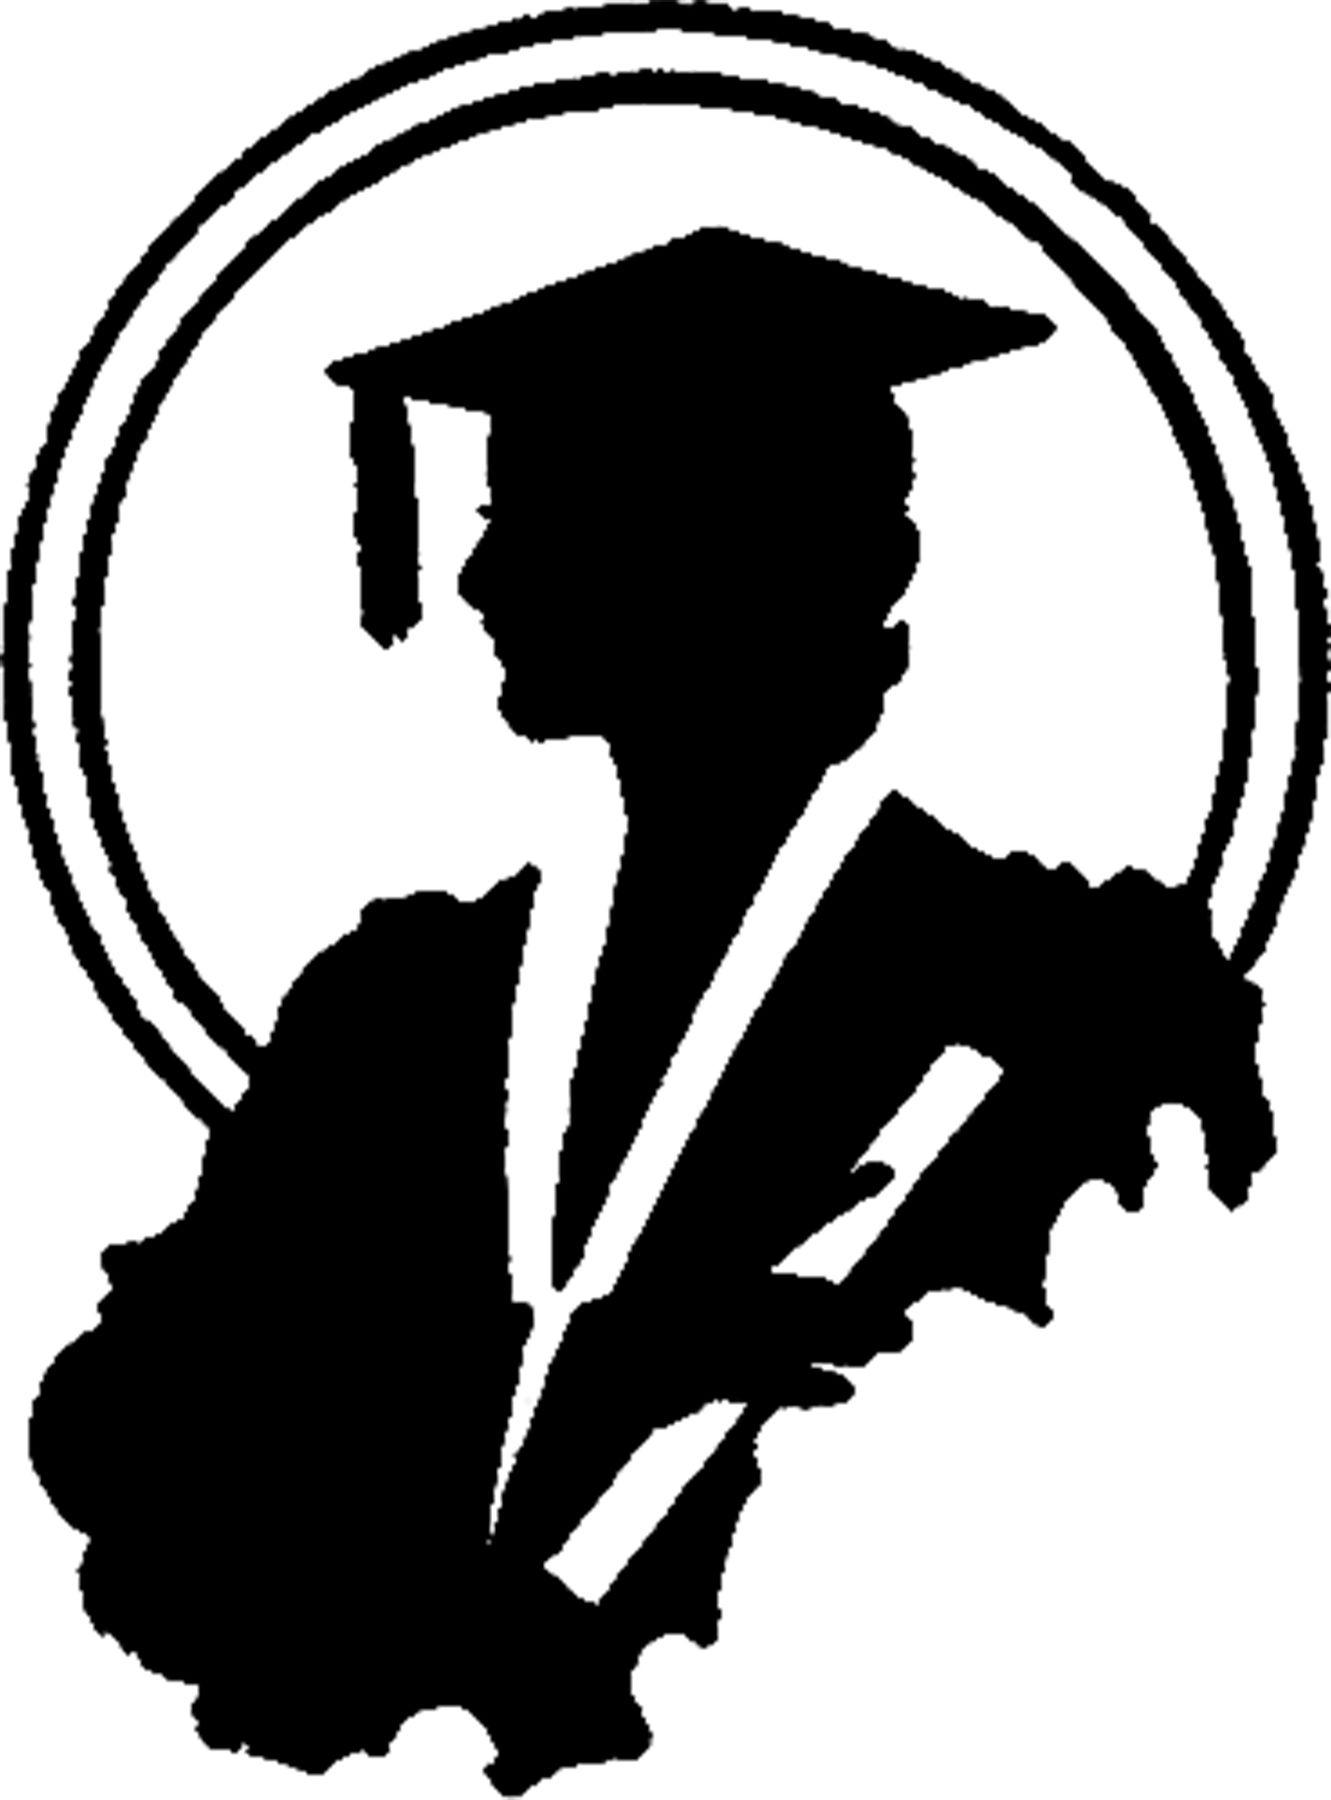 Graduation Silhouette Girl Image